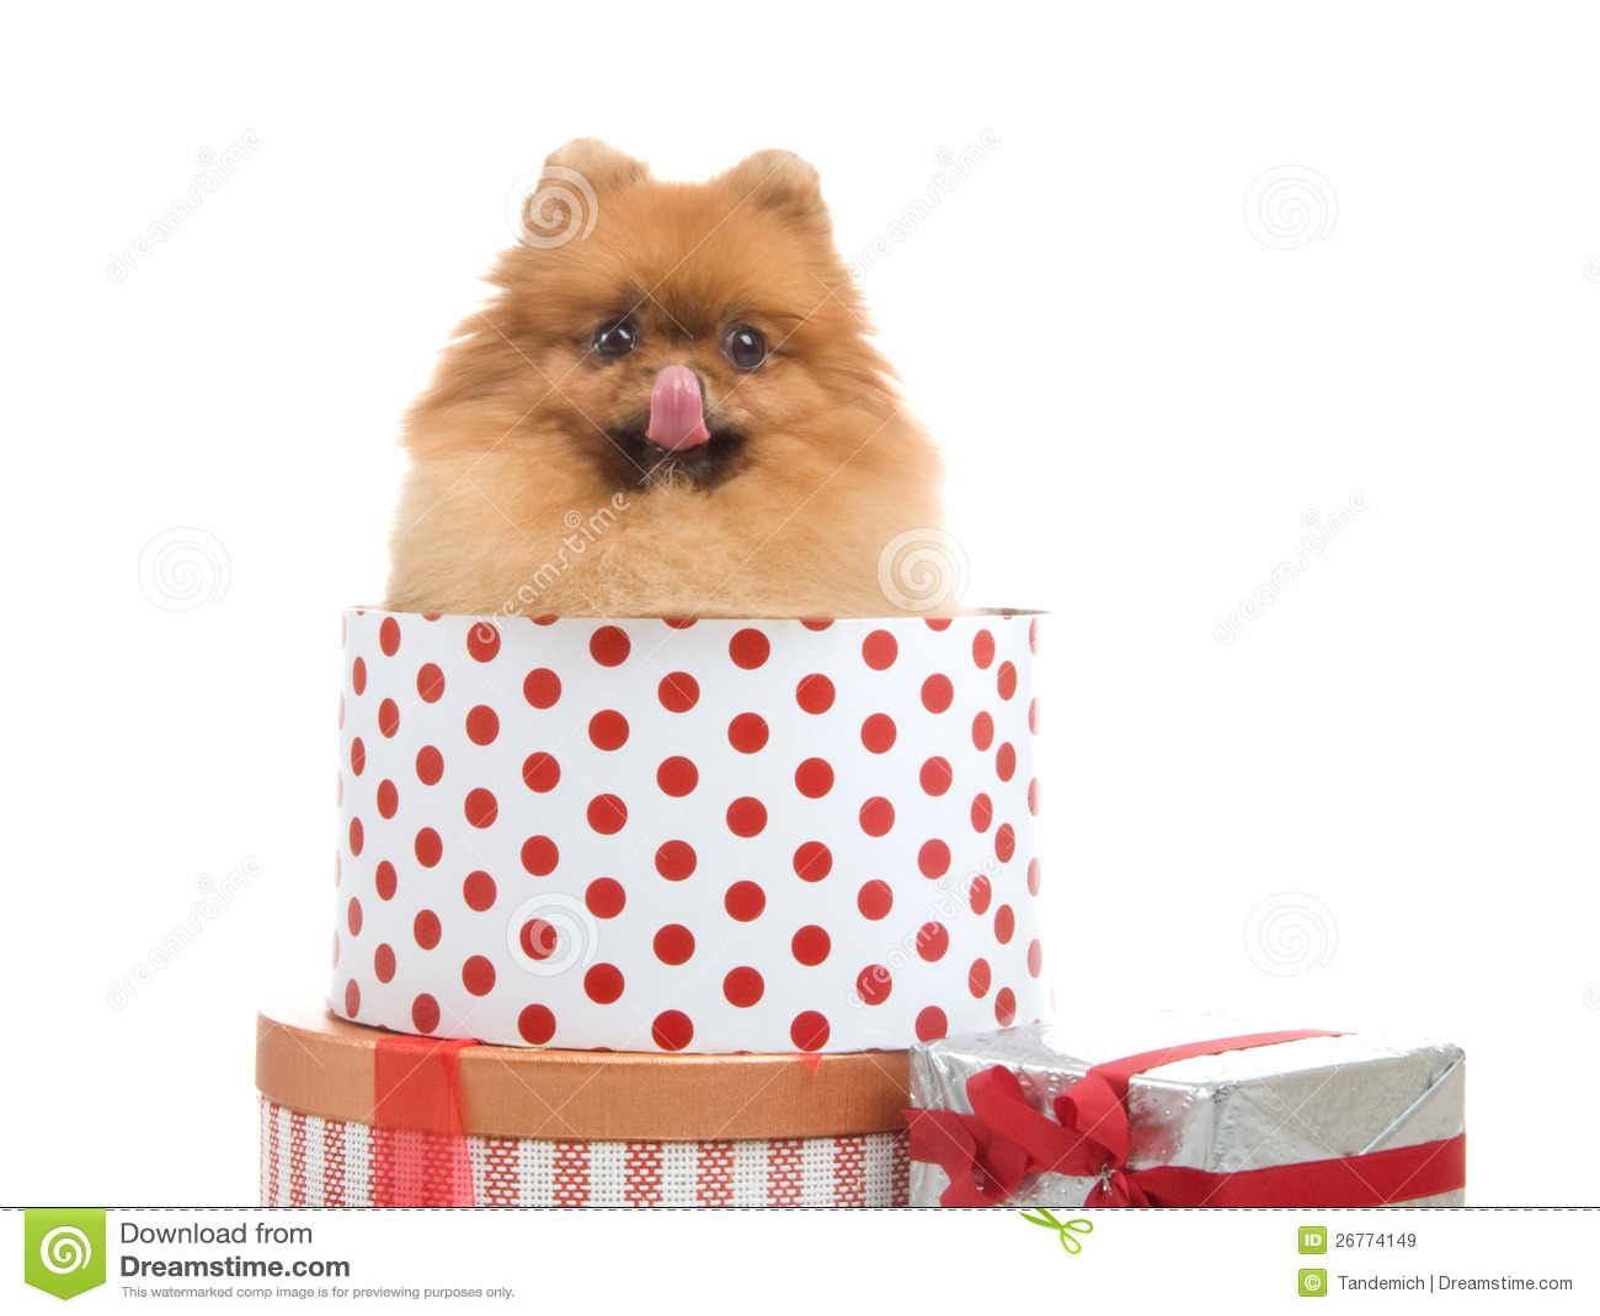 Spitz, Pomeranian Dog In Gift-box Royalty Free Stock Images ...